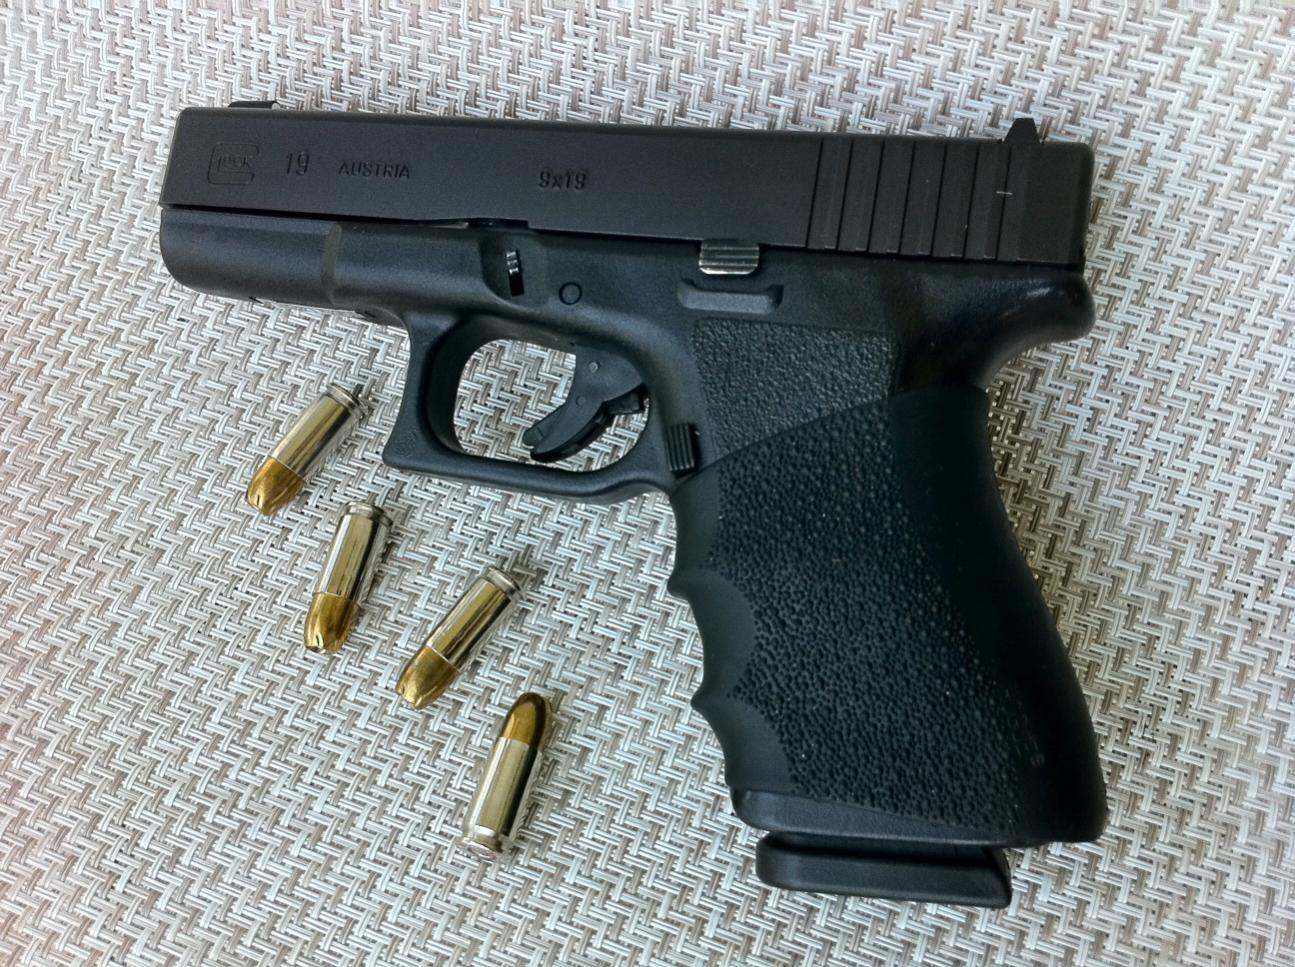 Glock 23 question-photo.jpg